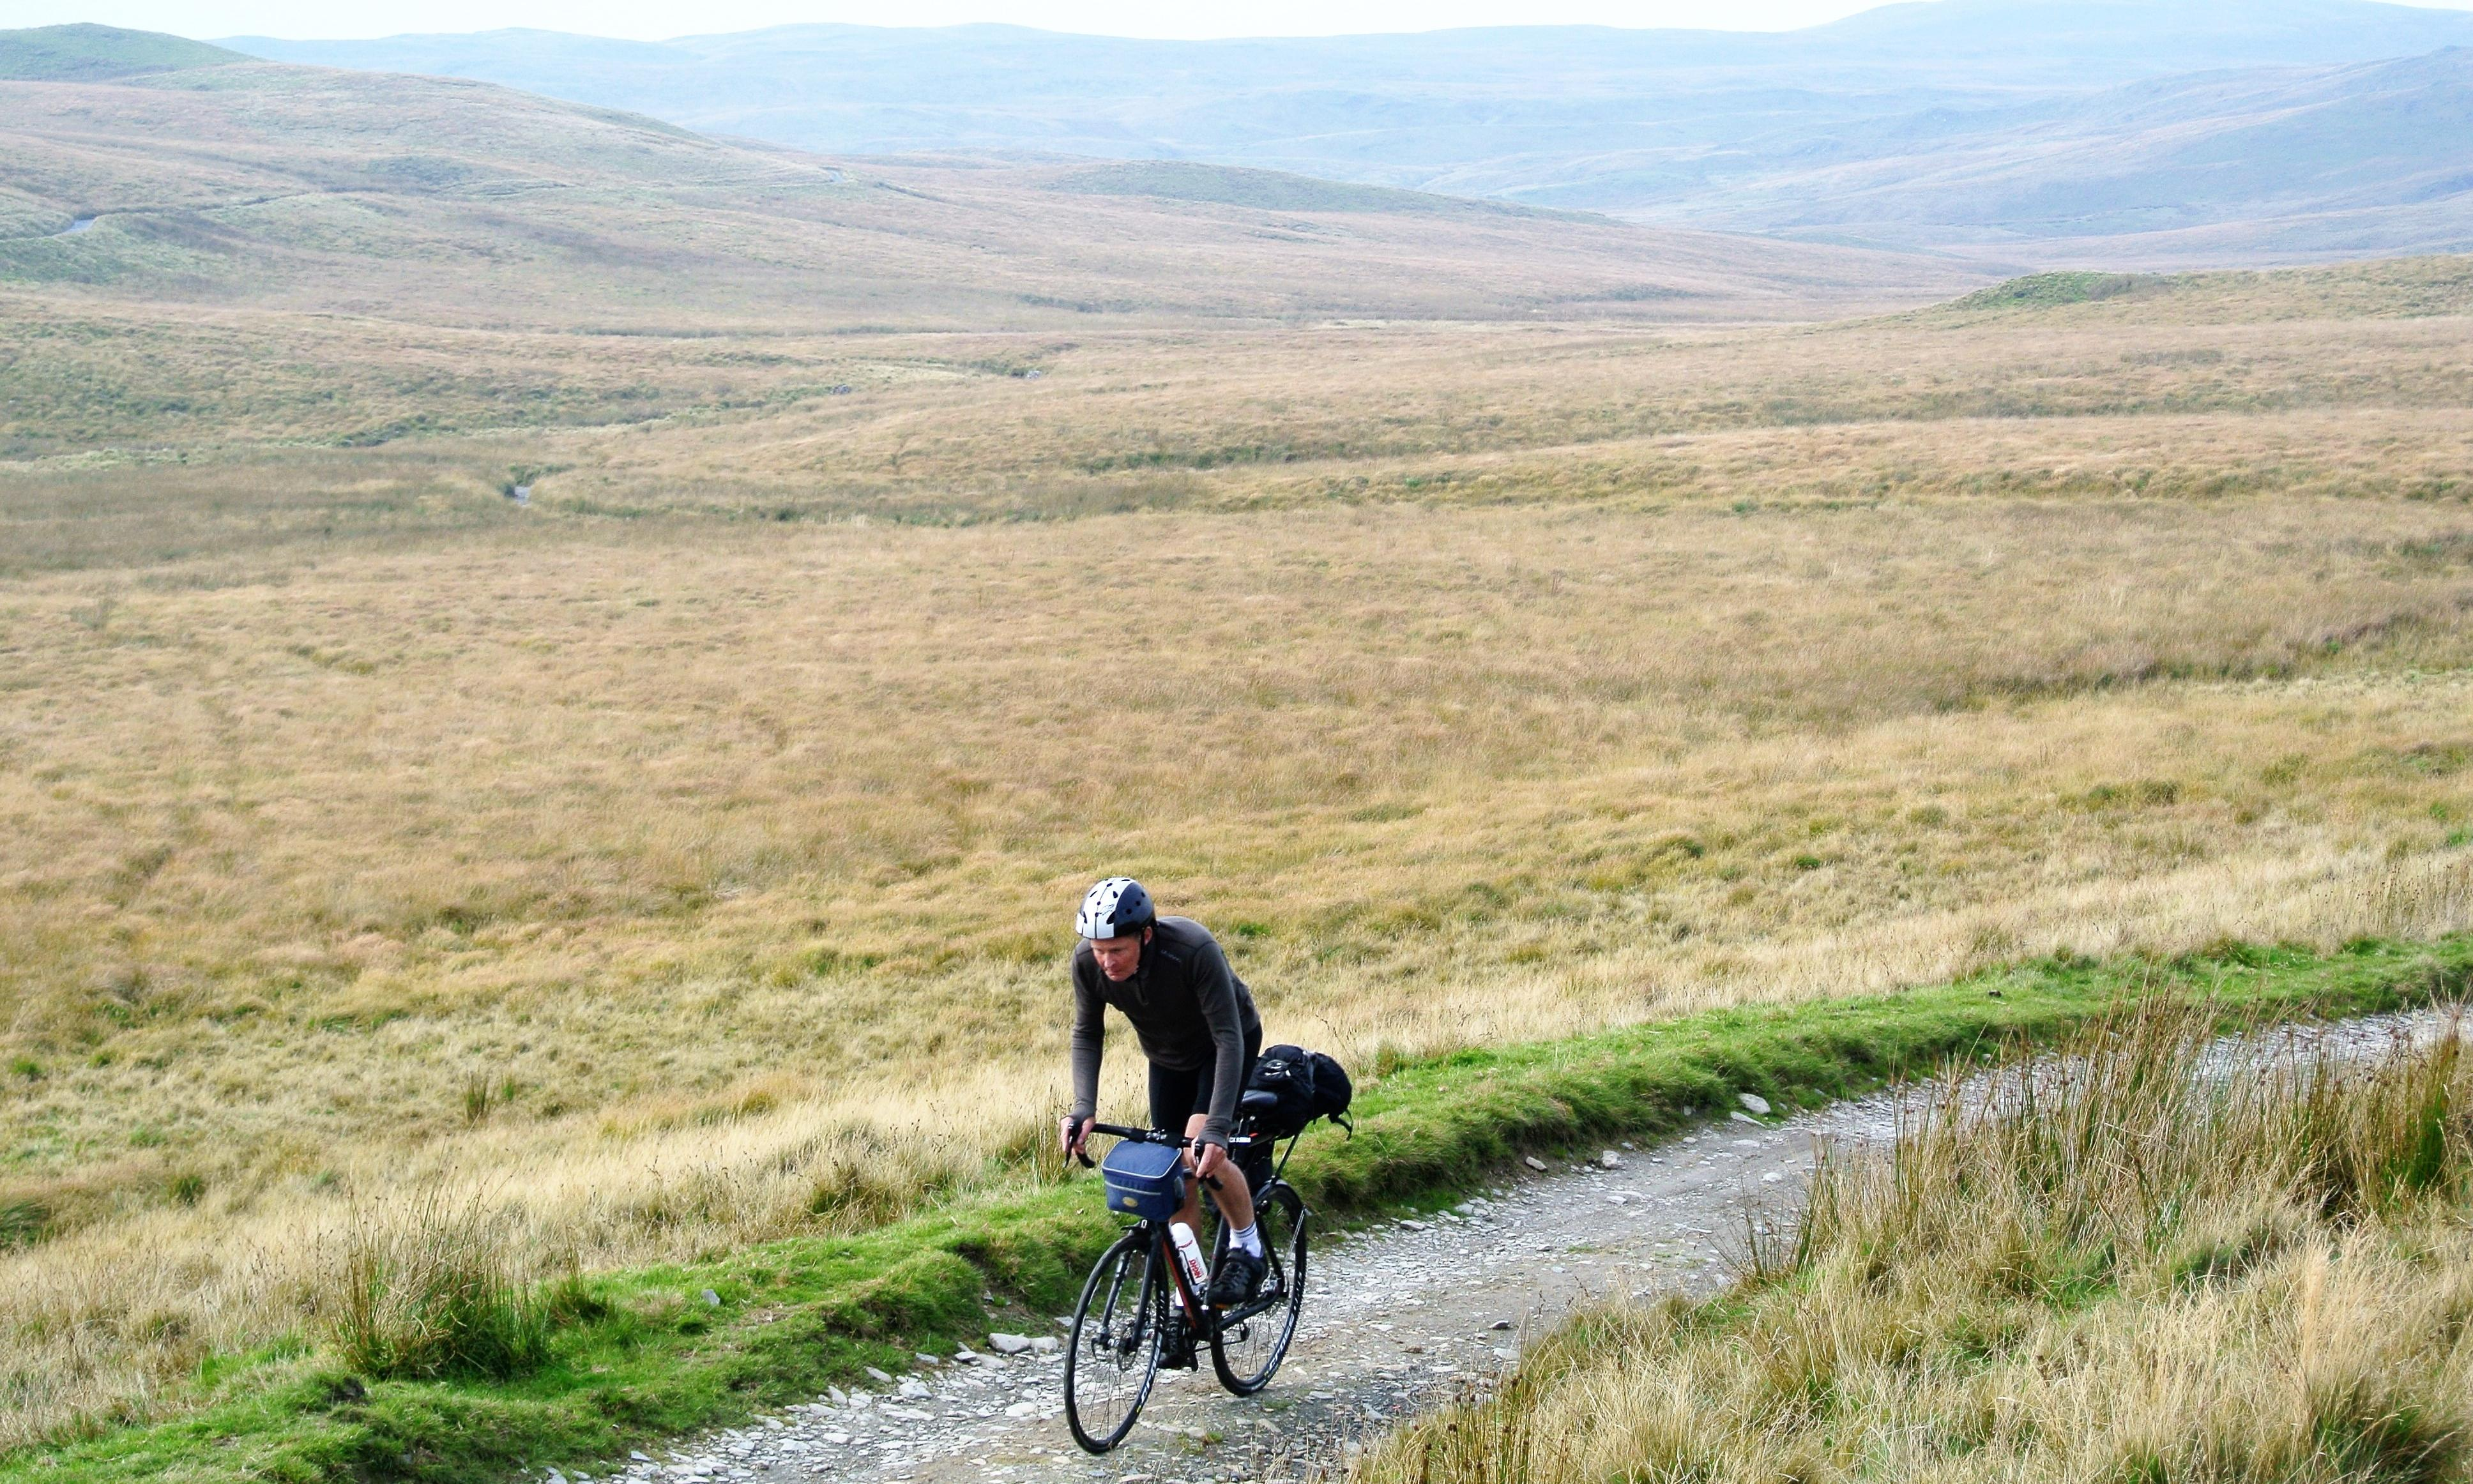 True grit: gravel biking through Wales' ancient Cambrian heart